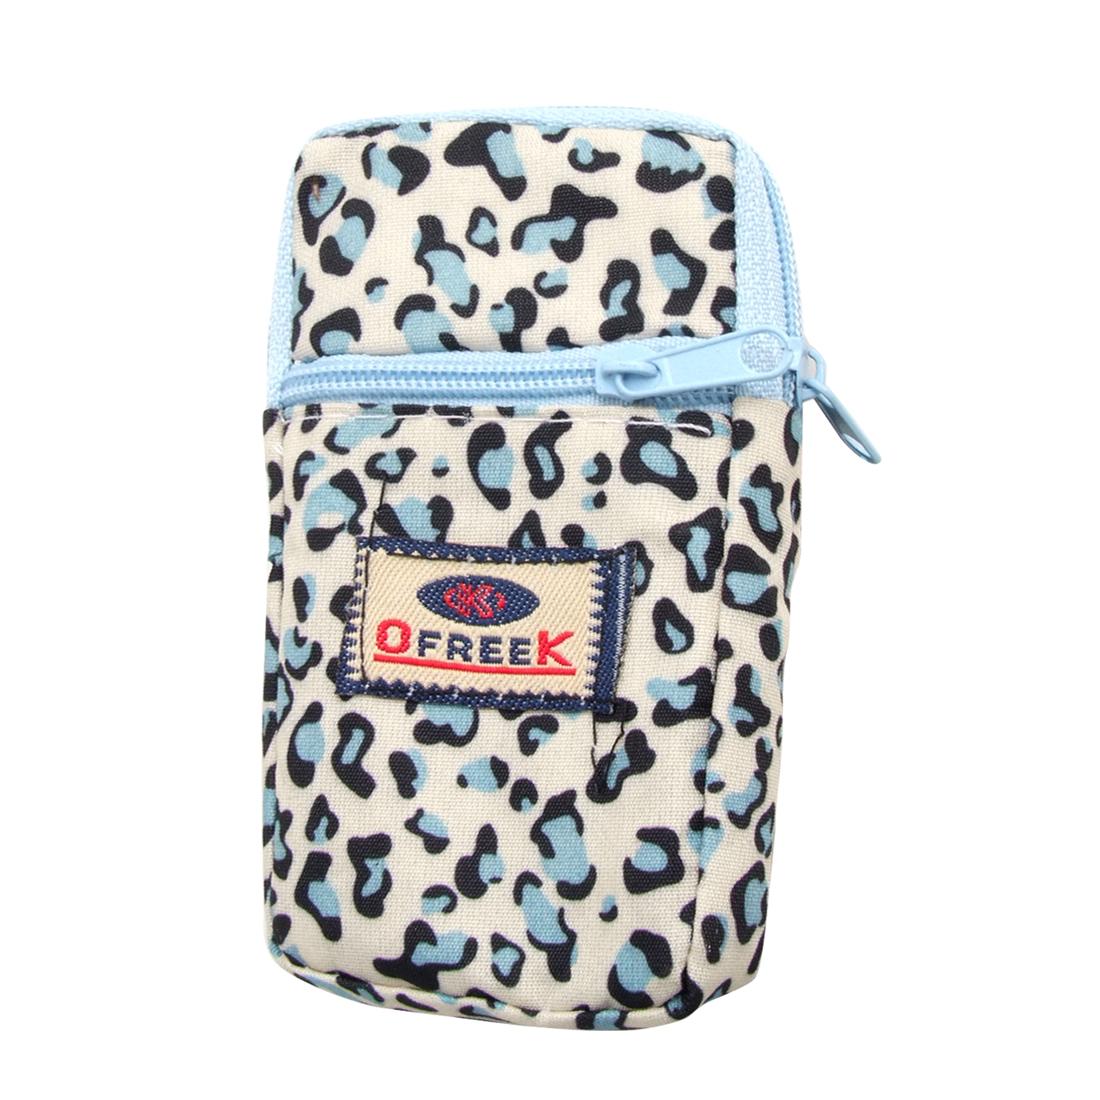 Sky Blue Black Leopard Pattern Elastic Band Zip Closure Cellphone Wrist Bag